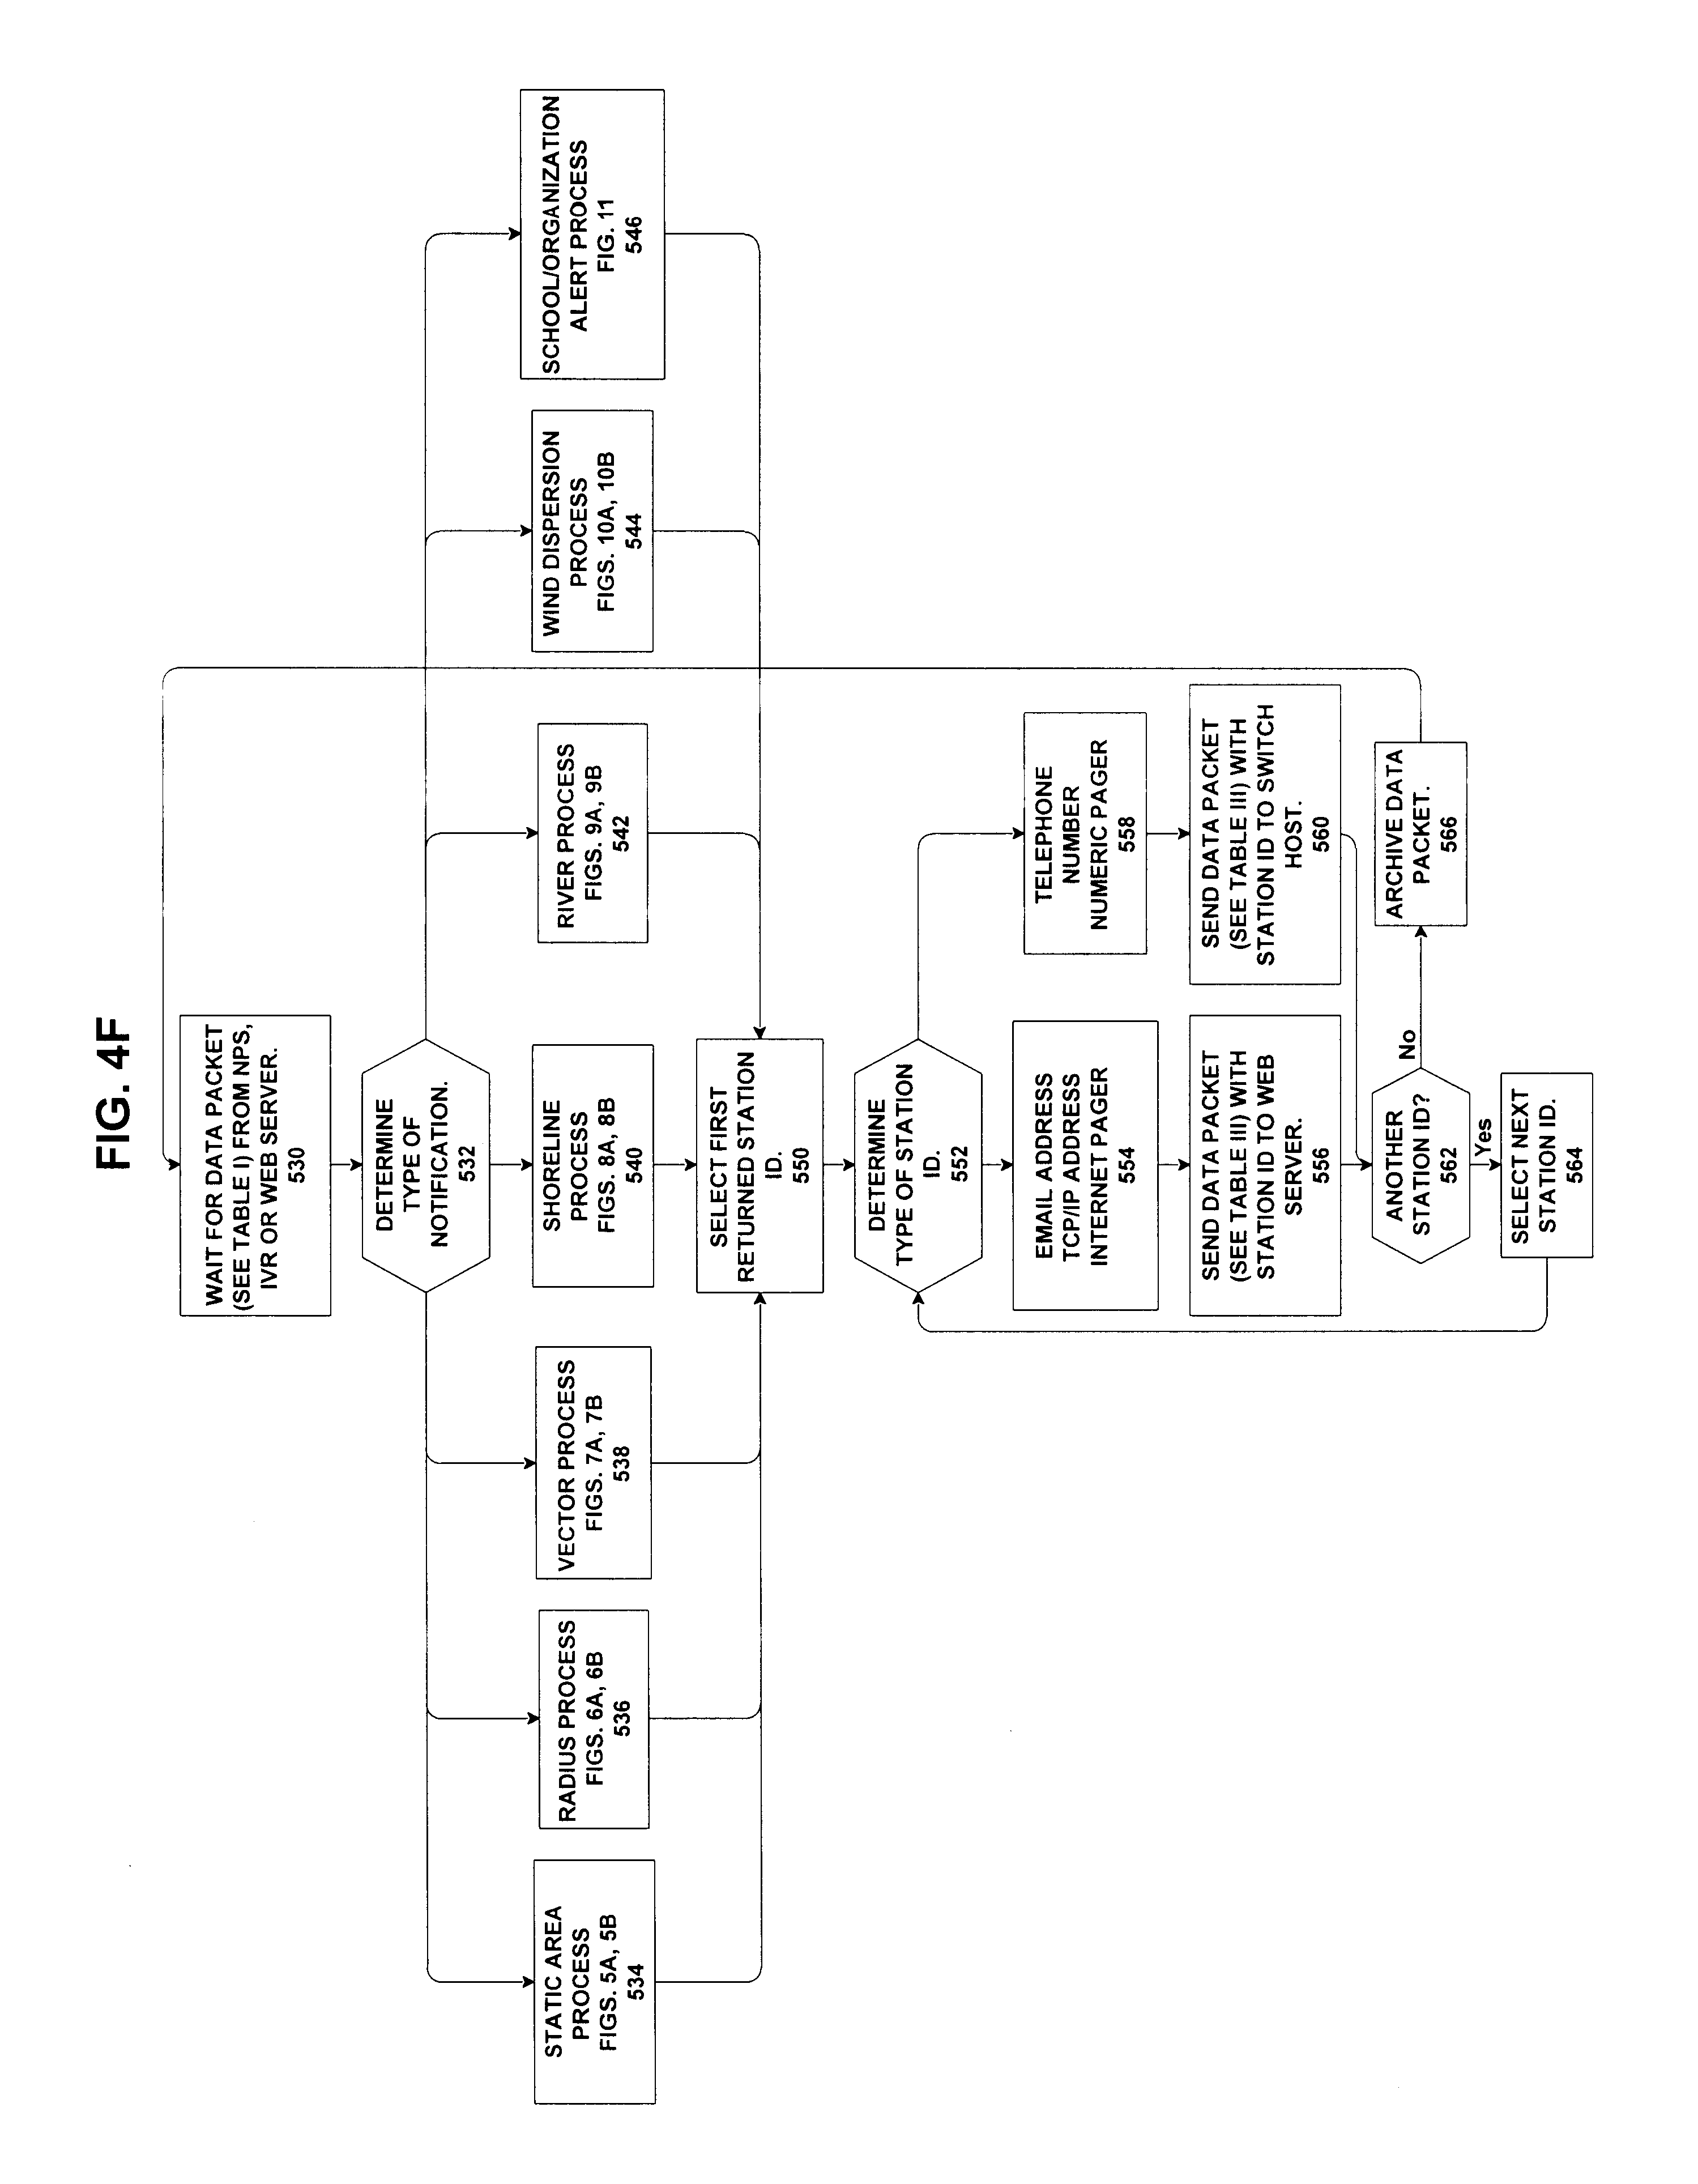 Patent US 6816878 B1